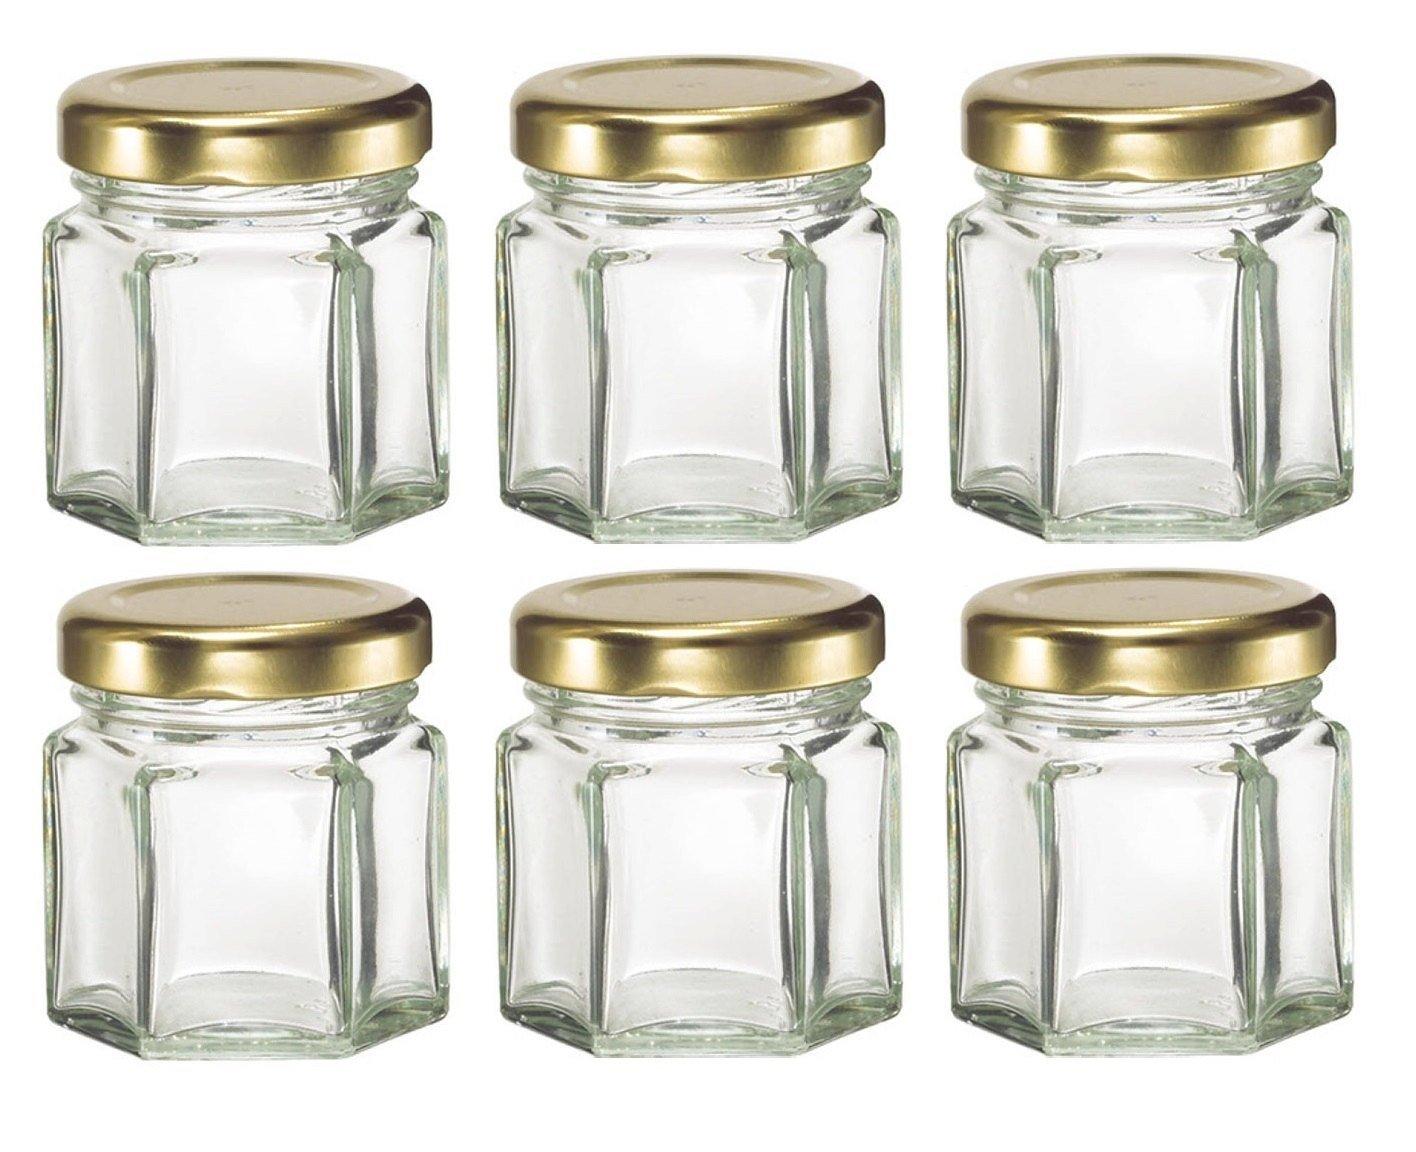 Buy 6, 1.5 oz Mini Oval Hexagon Glass Jars for Jam, Honey, Wedding ...